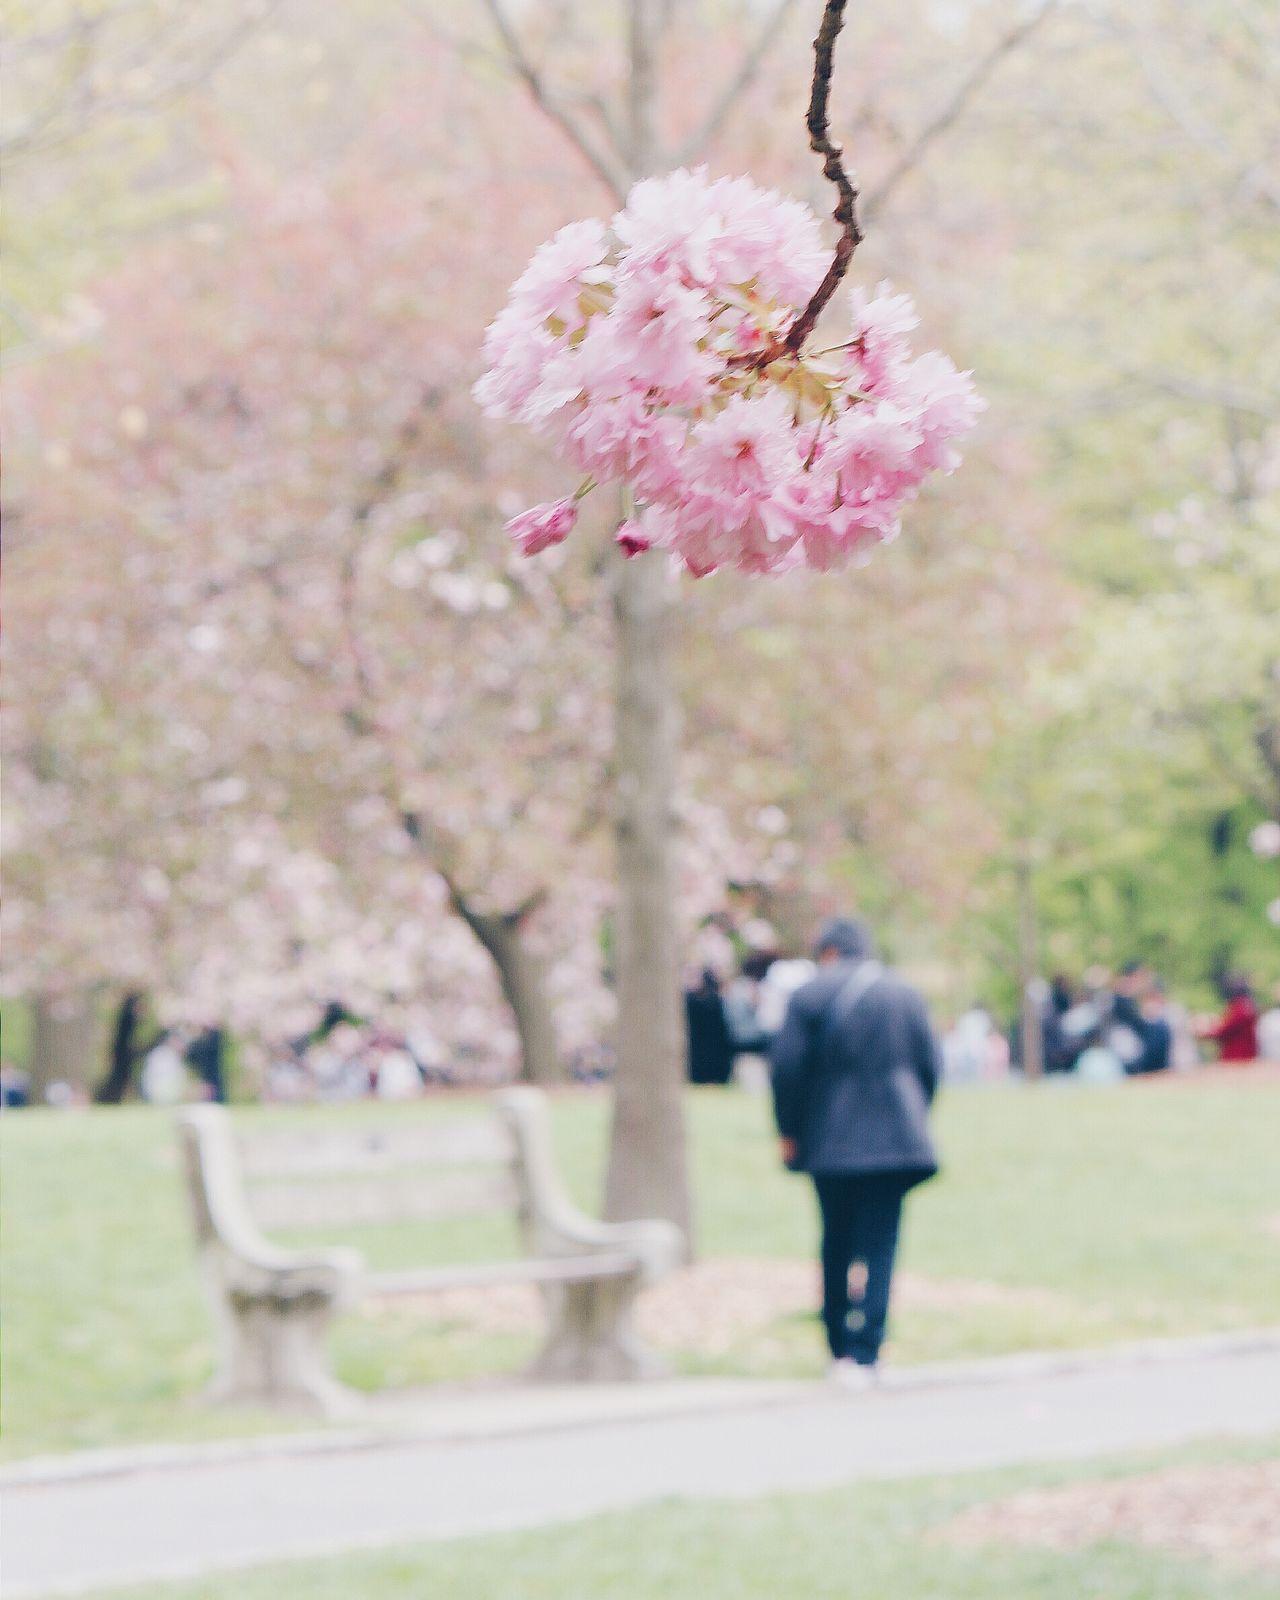 Hanging Out Cherry Blossoms Cherry Blossom BrooklynBotanicGarden BrooklynBotancialGarden New York Beautiful Beautiful Nature Beauty In Nature Beauty Cherryblossom Cherry Blossom Tree